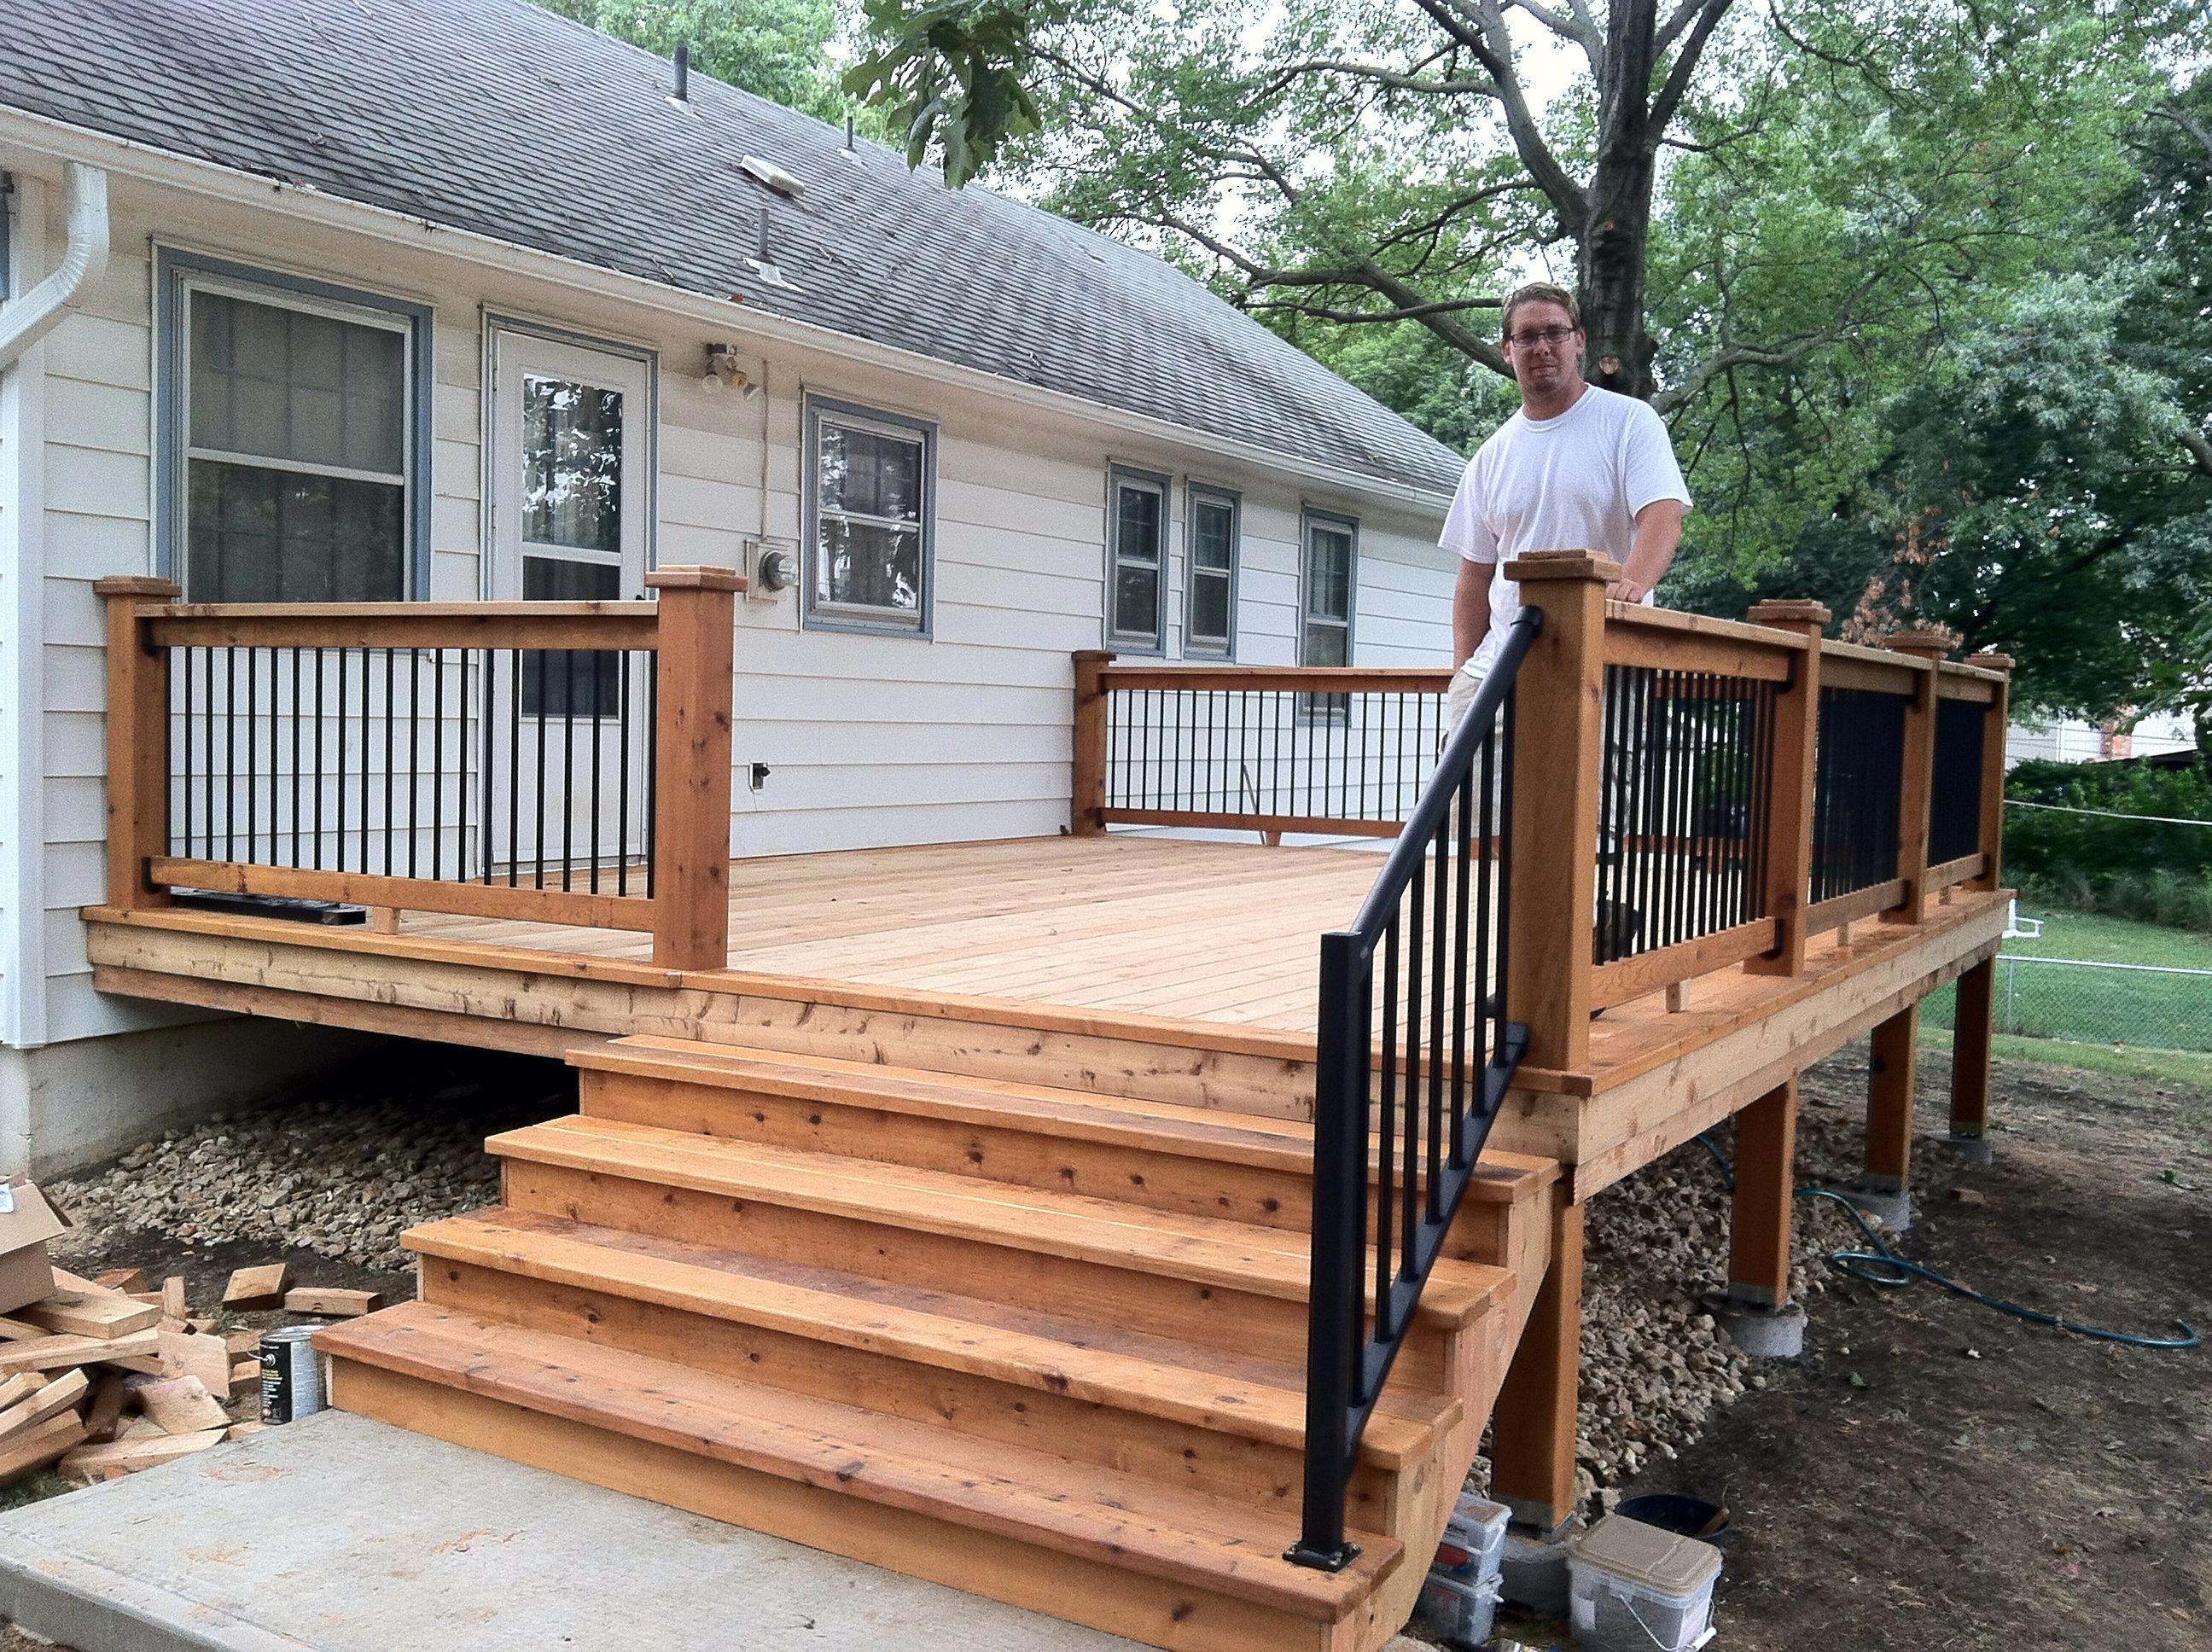 A small back deck. #backyardideasonabudget | Back deck ... on Simple Back Deck Ideas id=75937